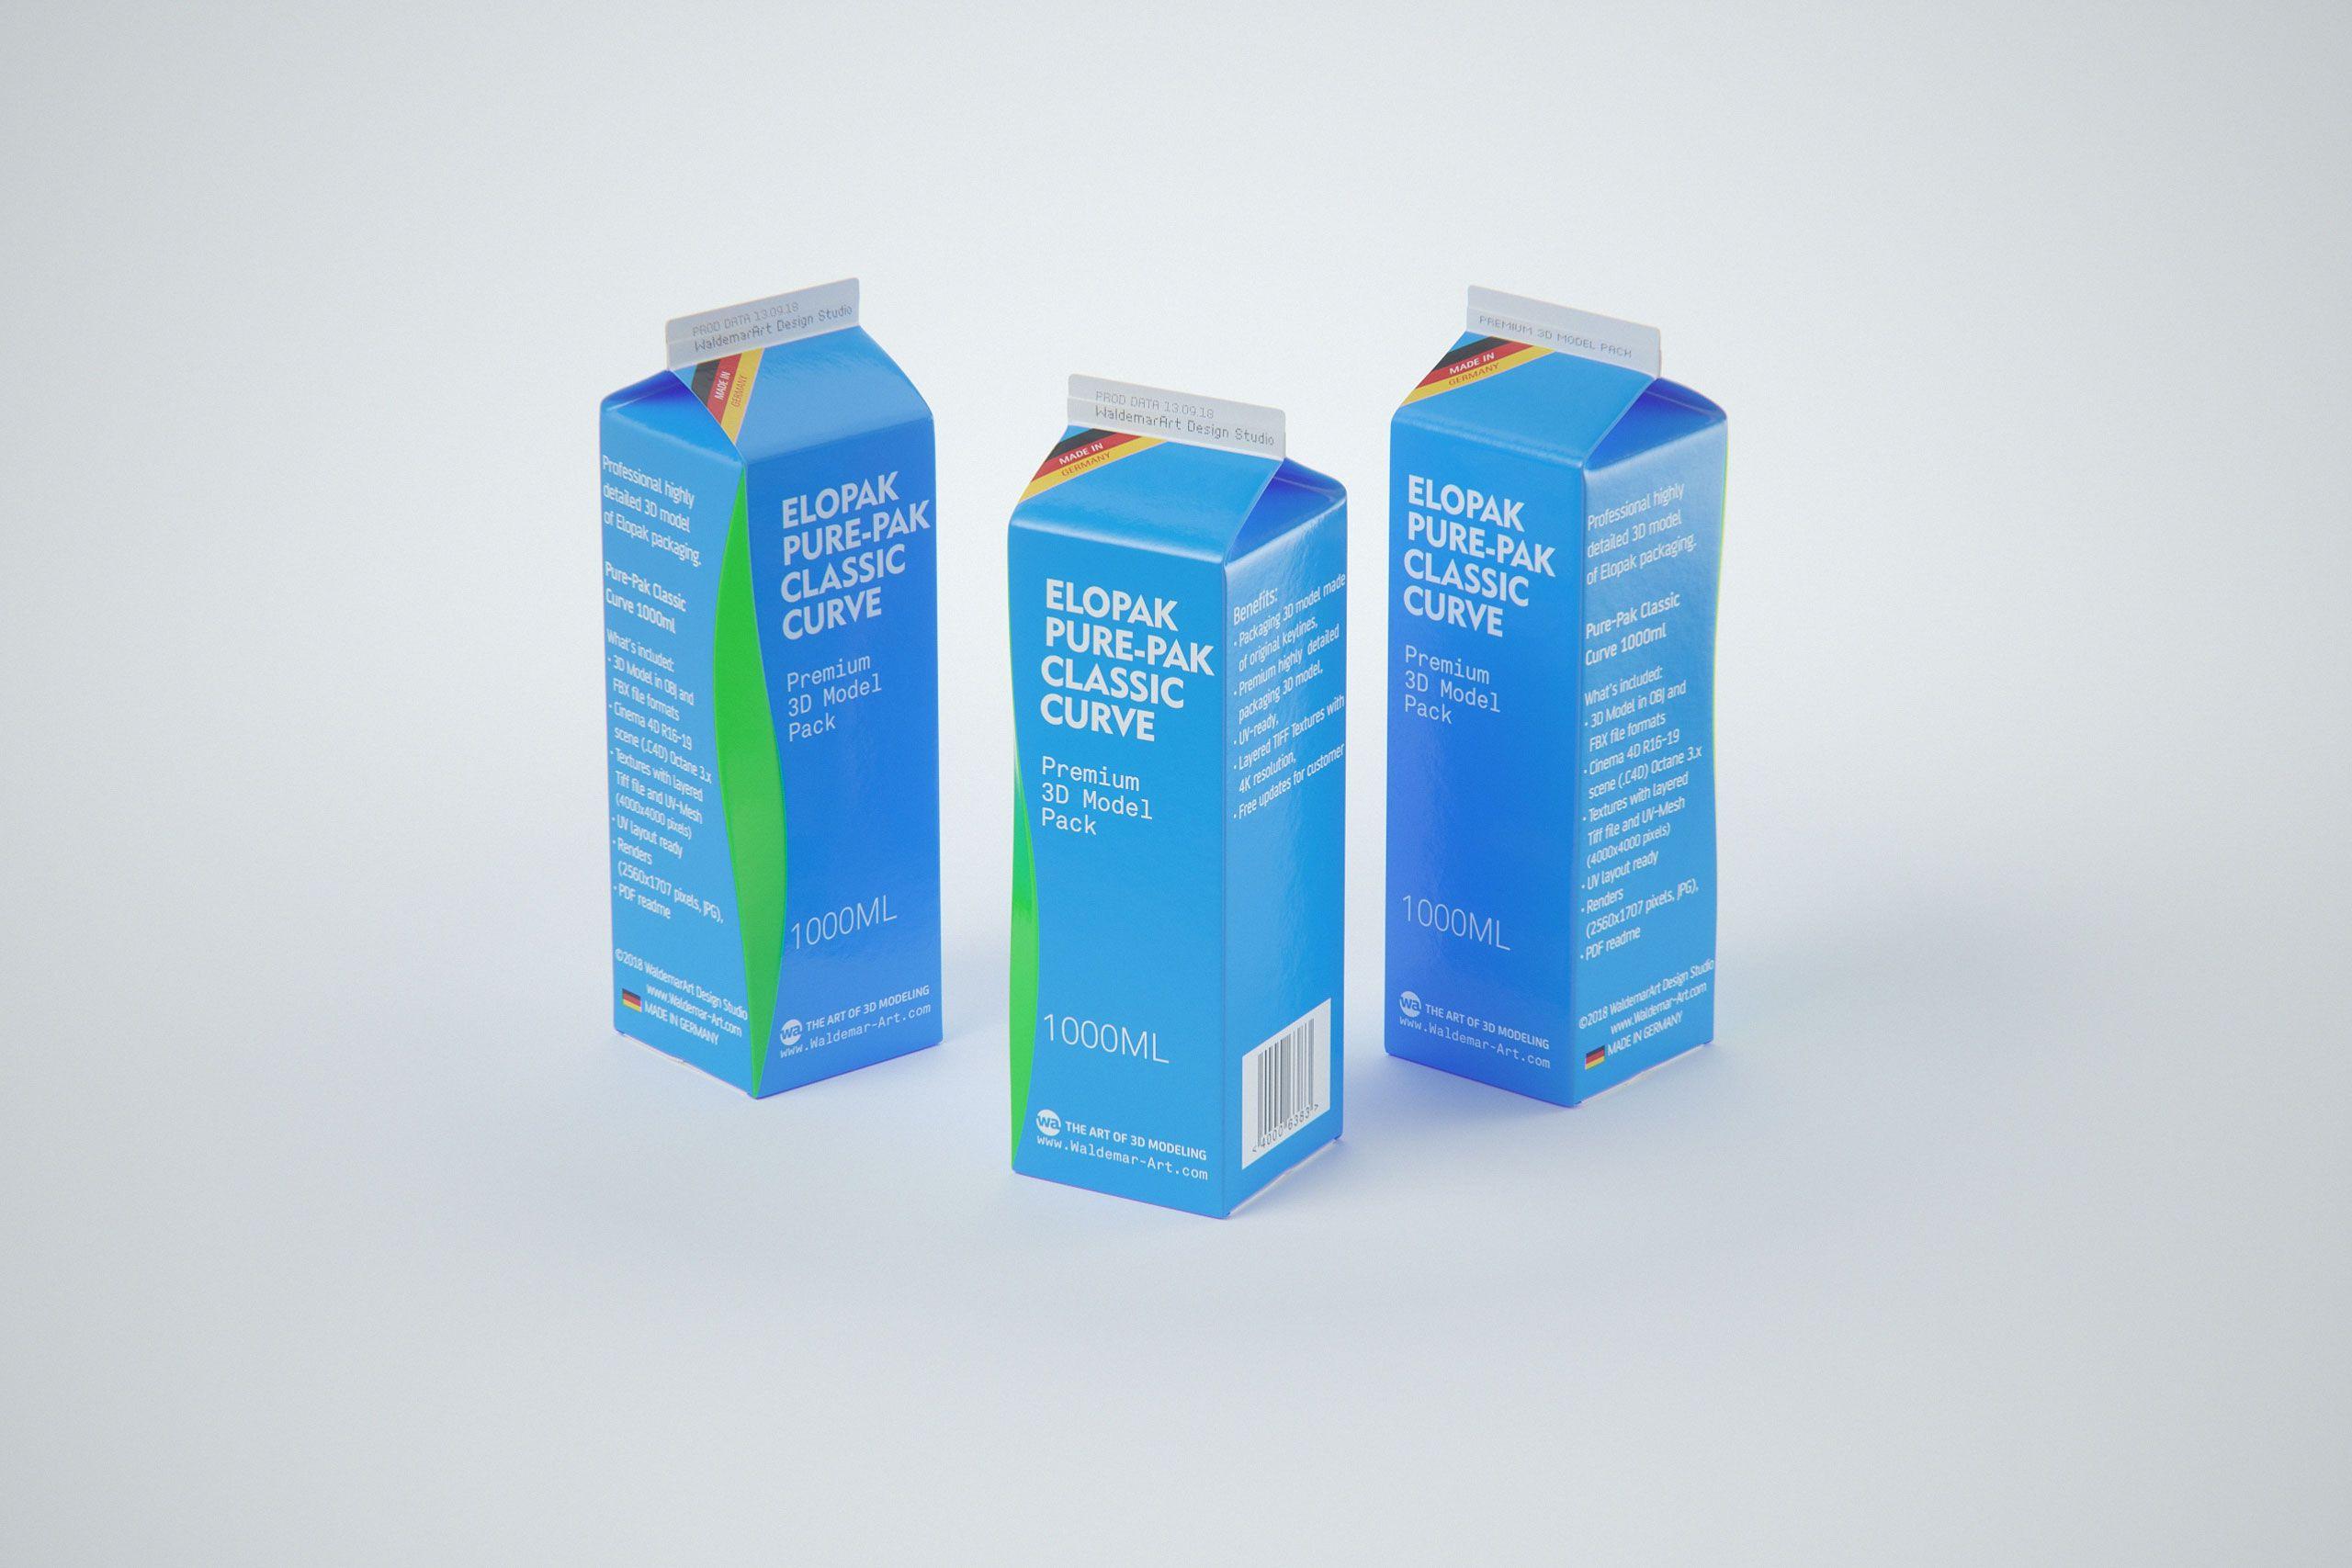 Elopak Pure-Pak Classic CURVE 1000ml (no opening) Premium carton